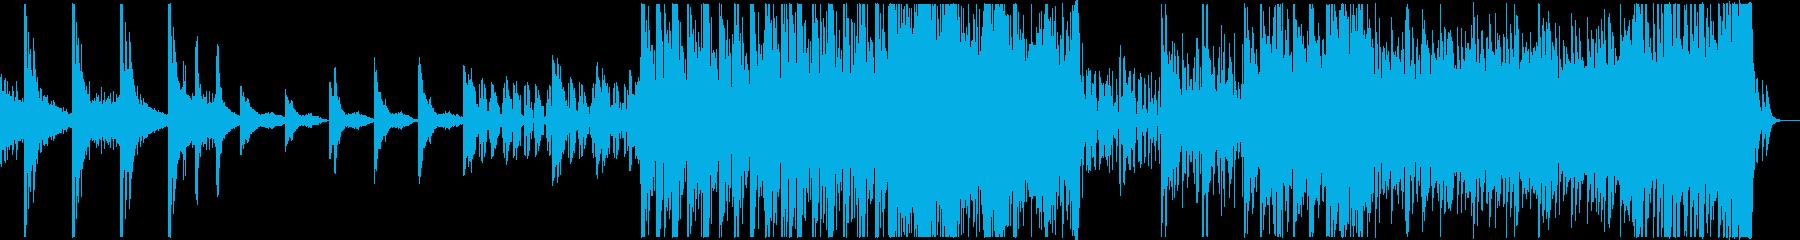 SF/サイバーパンクな世界観の悲壮BGMの再生済みの波形